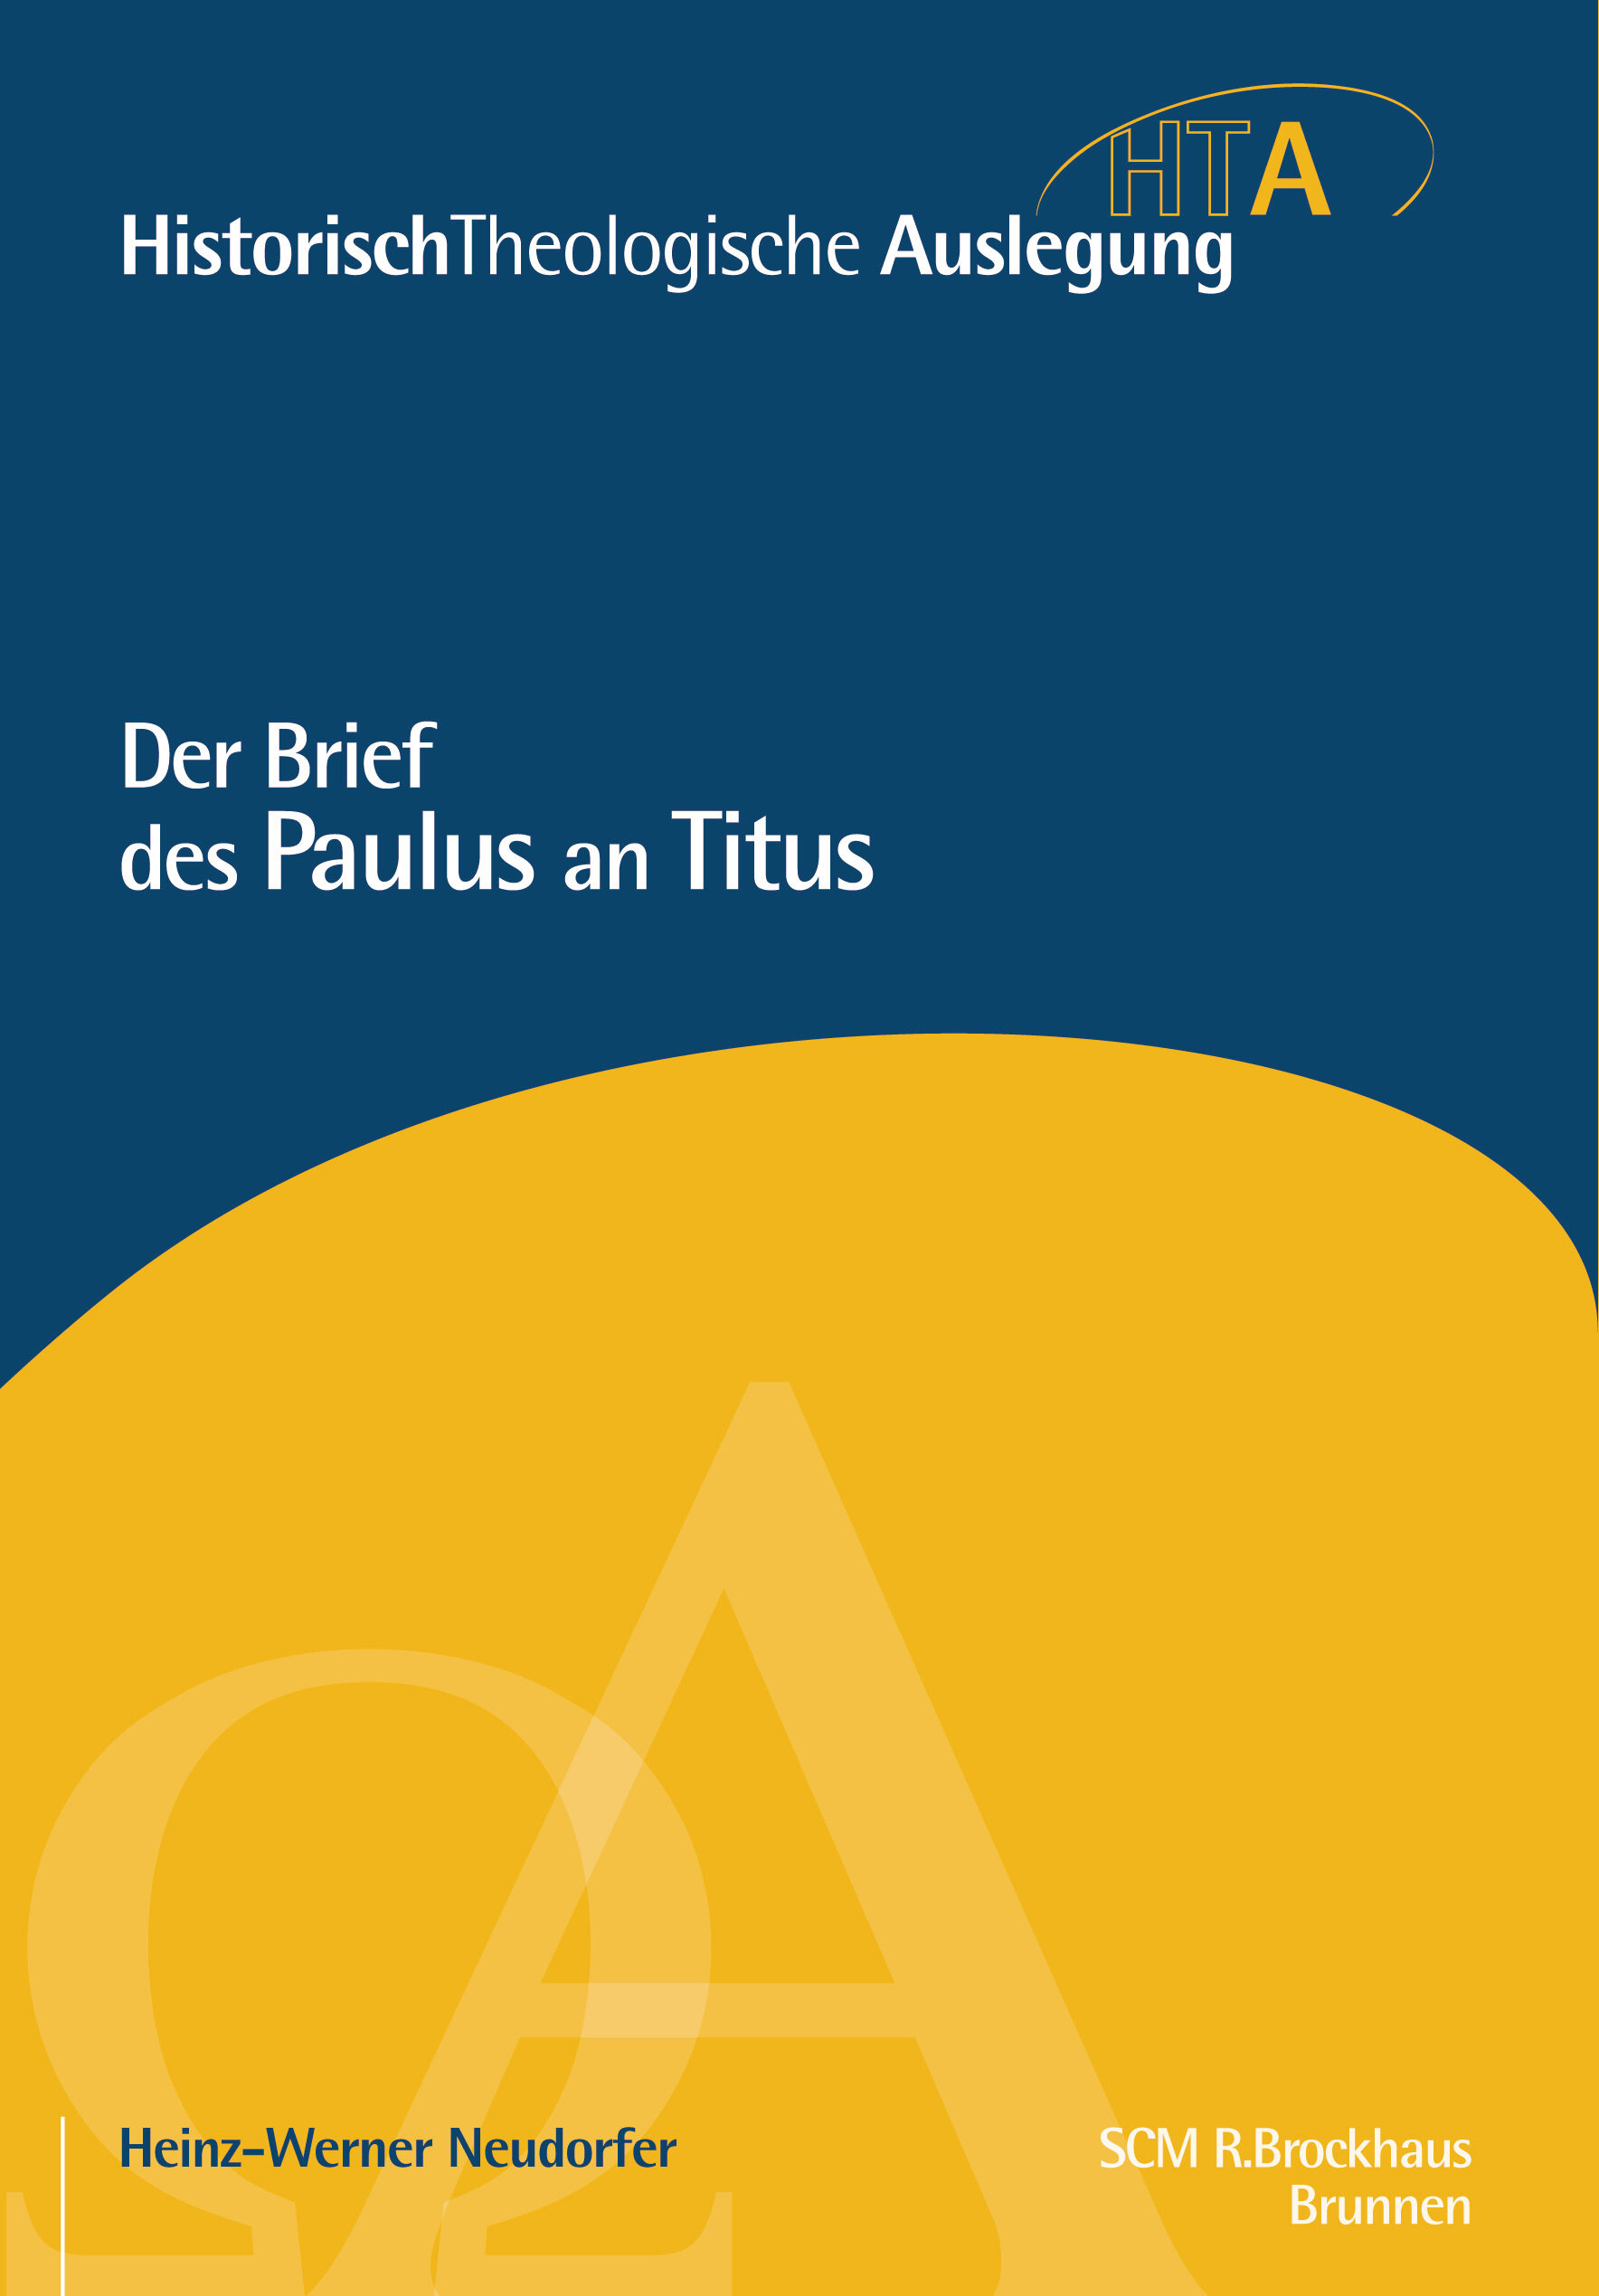 Der Brief des Apostels Paulus an Titus (Historisch-Theologische Auslegung | HTA)